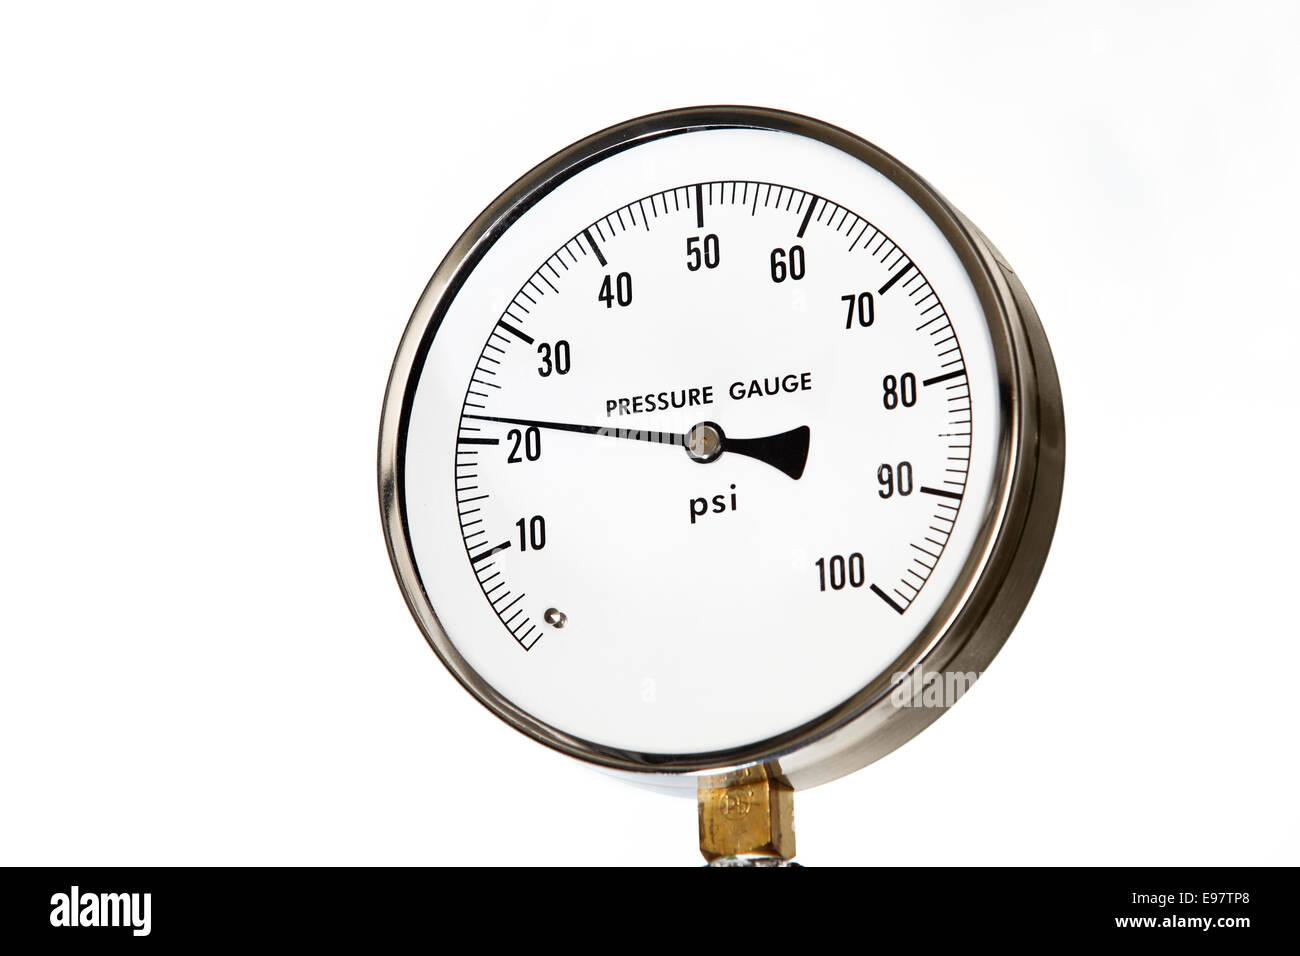 An industrial pressure gauge - Stock Image